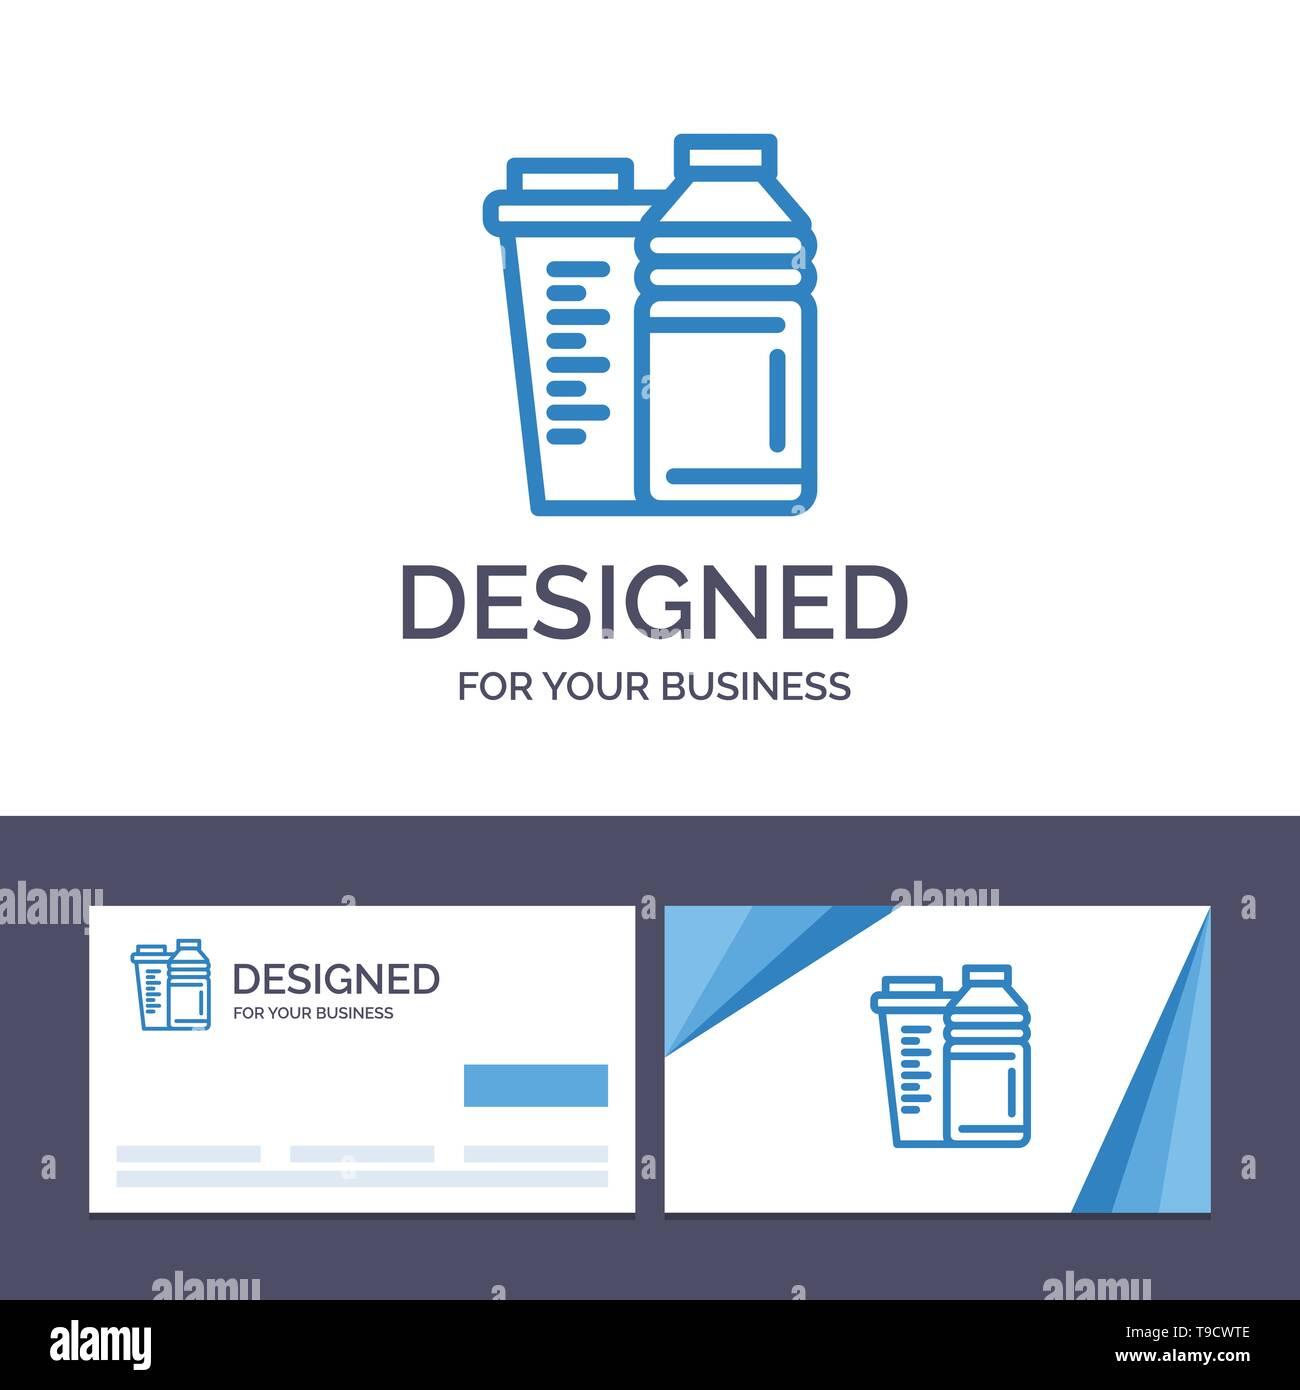 Creative Business Card and Logo template Bottle, Drink, Energy, Shaker, Sport Vector Illustration - Stock Image